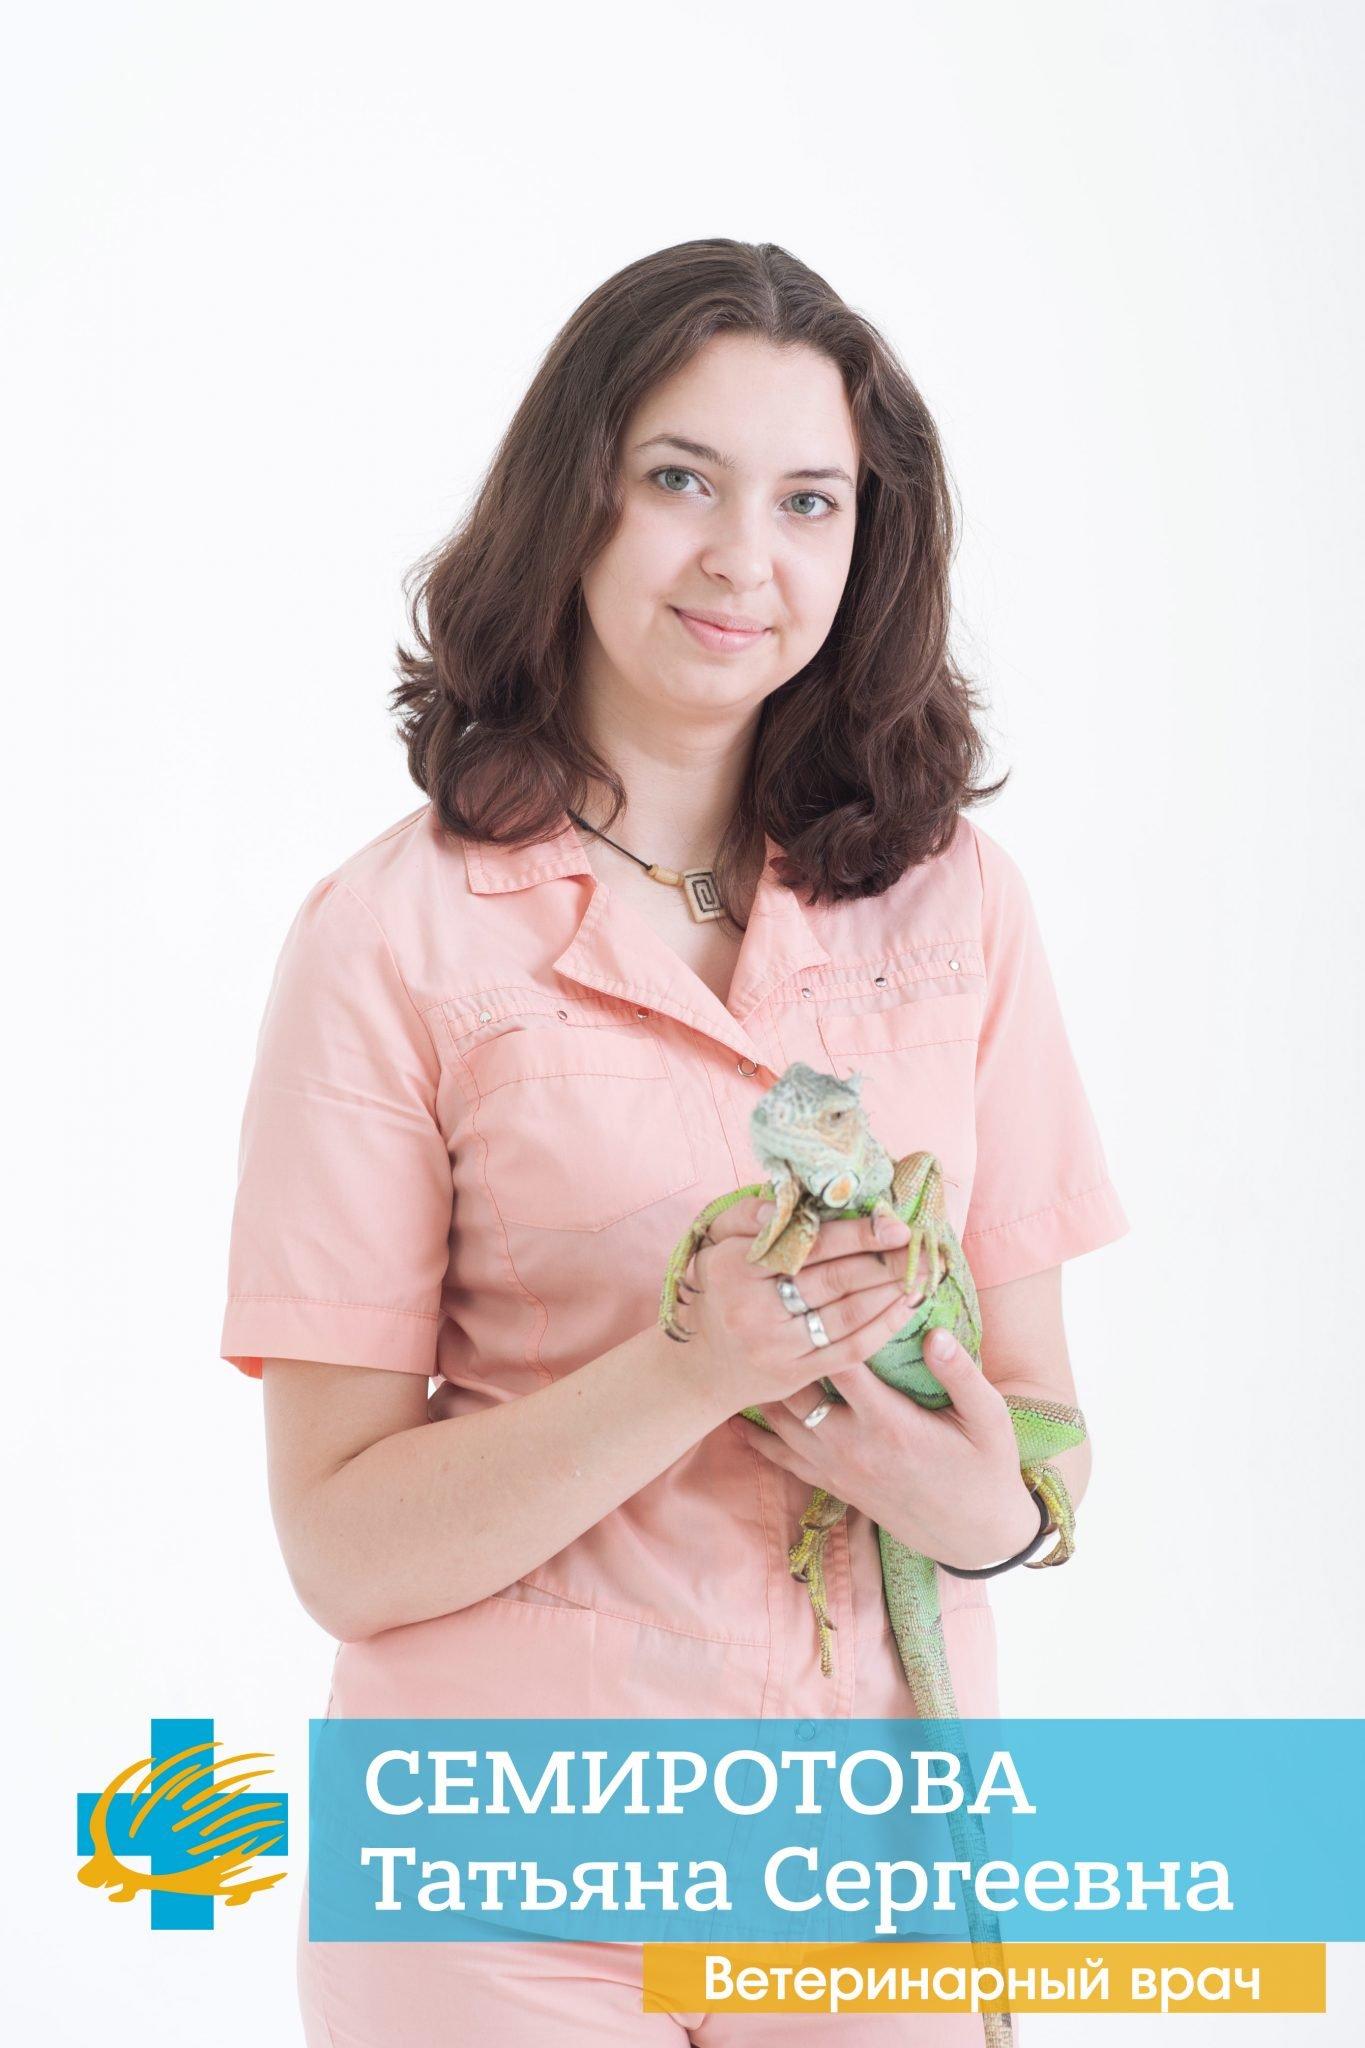 Семиротова Татьяна Сергеевна